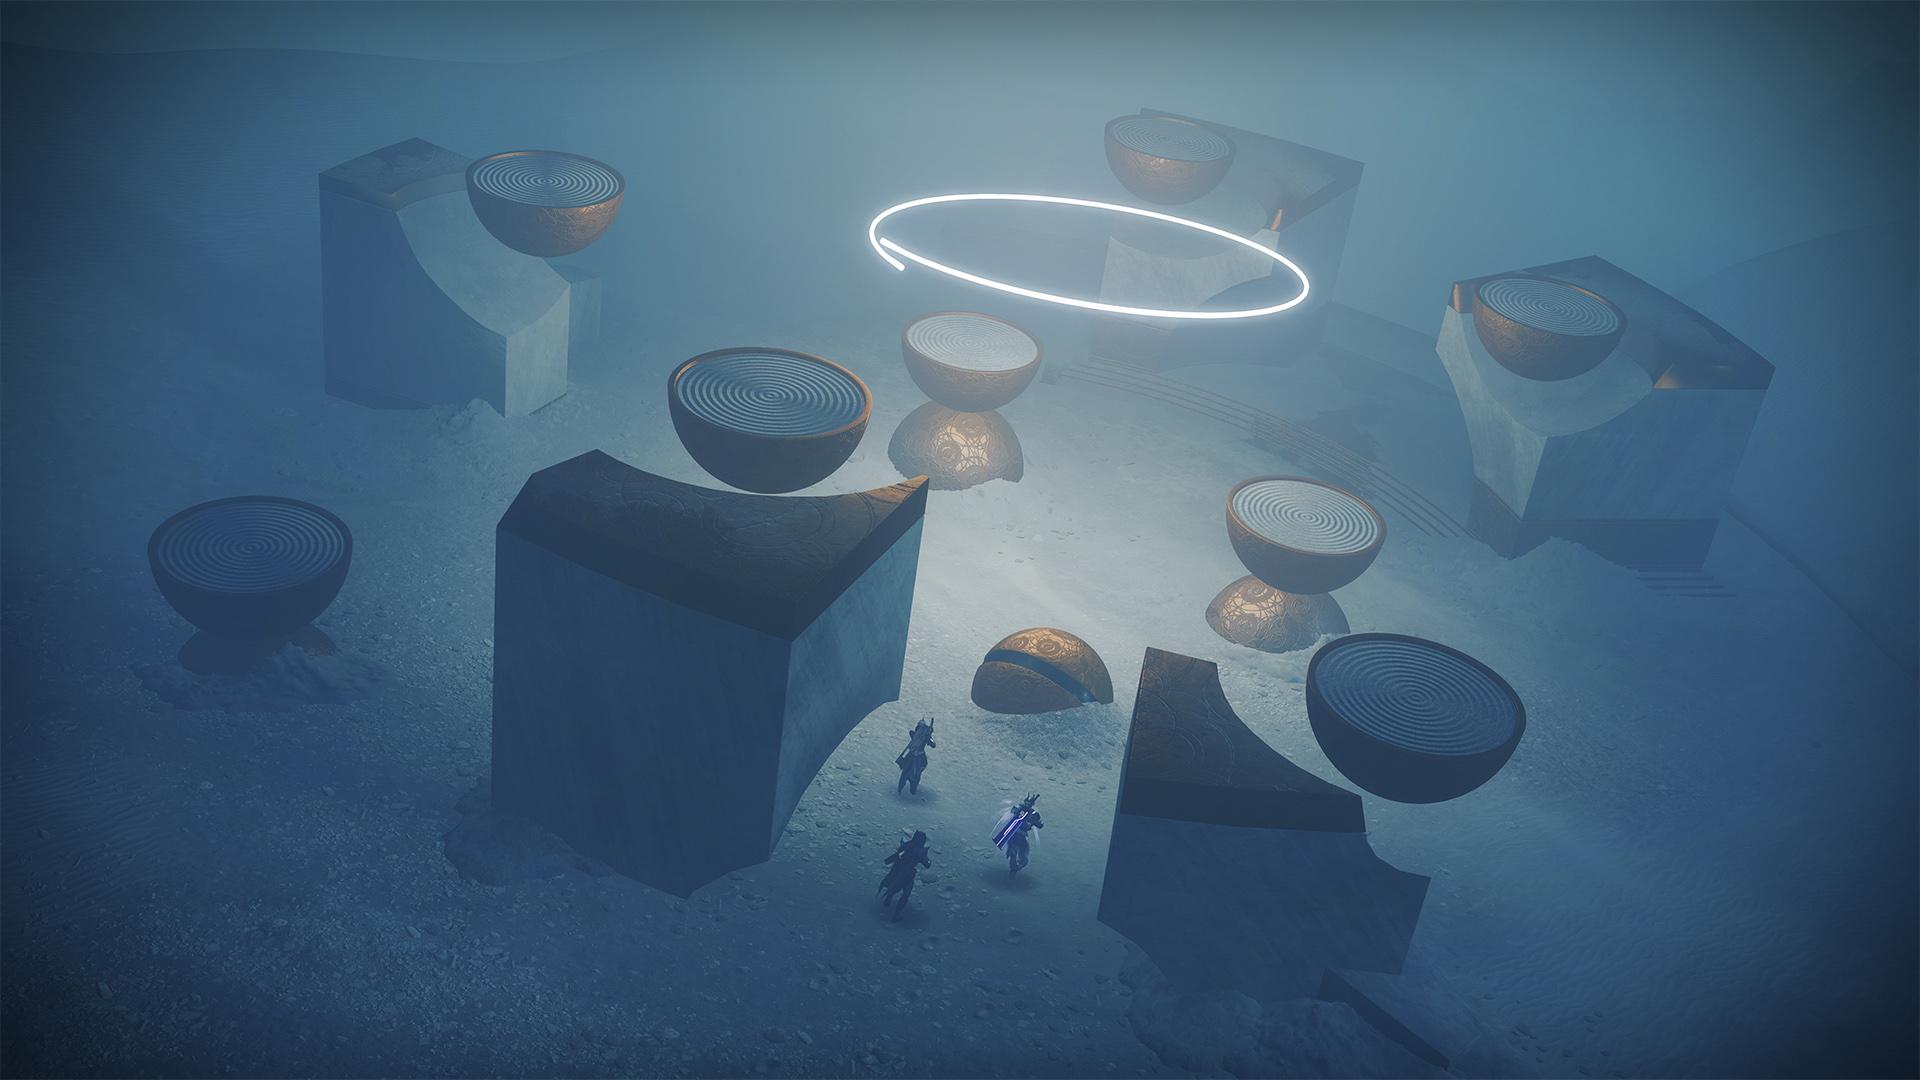 Destiny 2 Prophecy wasteland navigate the expanse